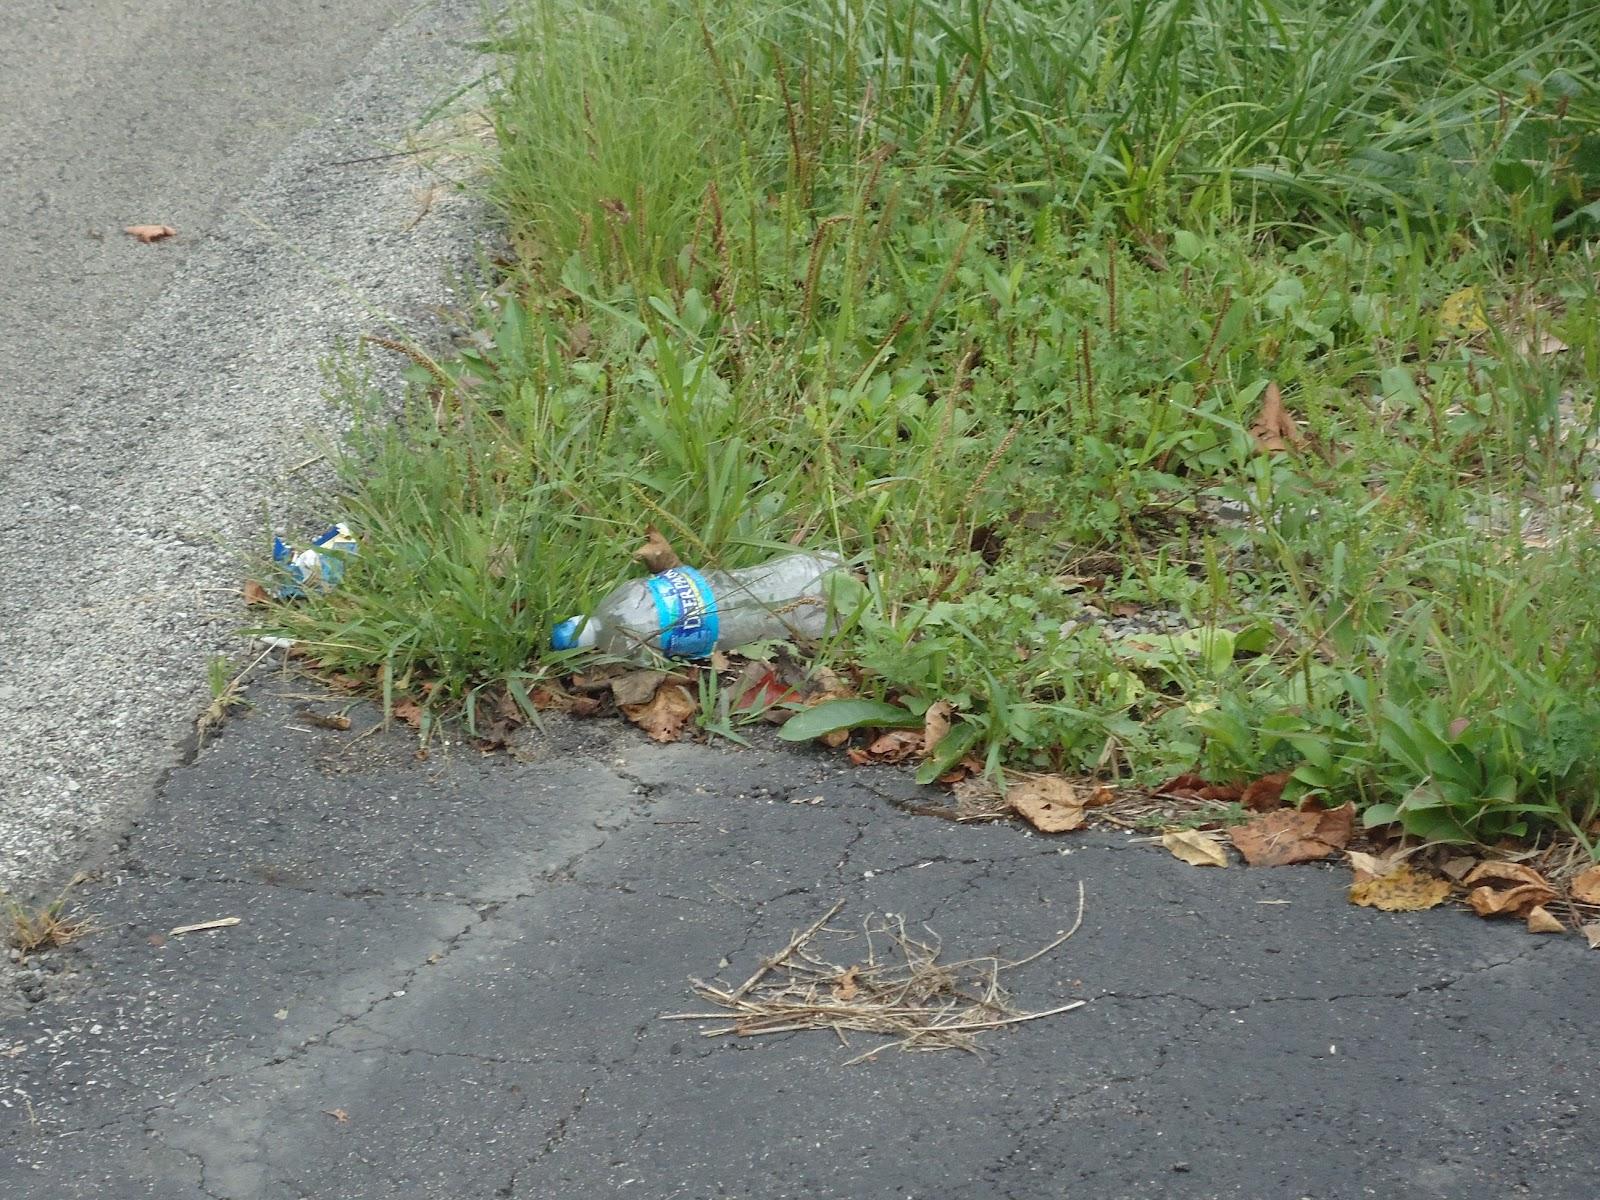 litter along road